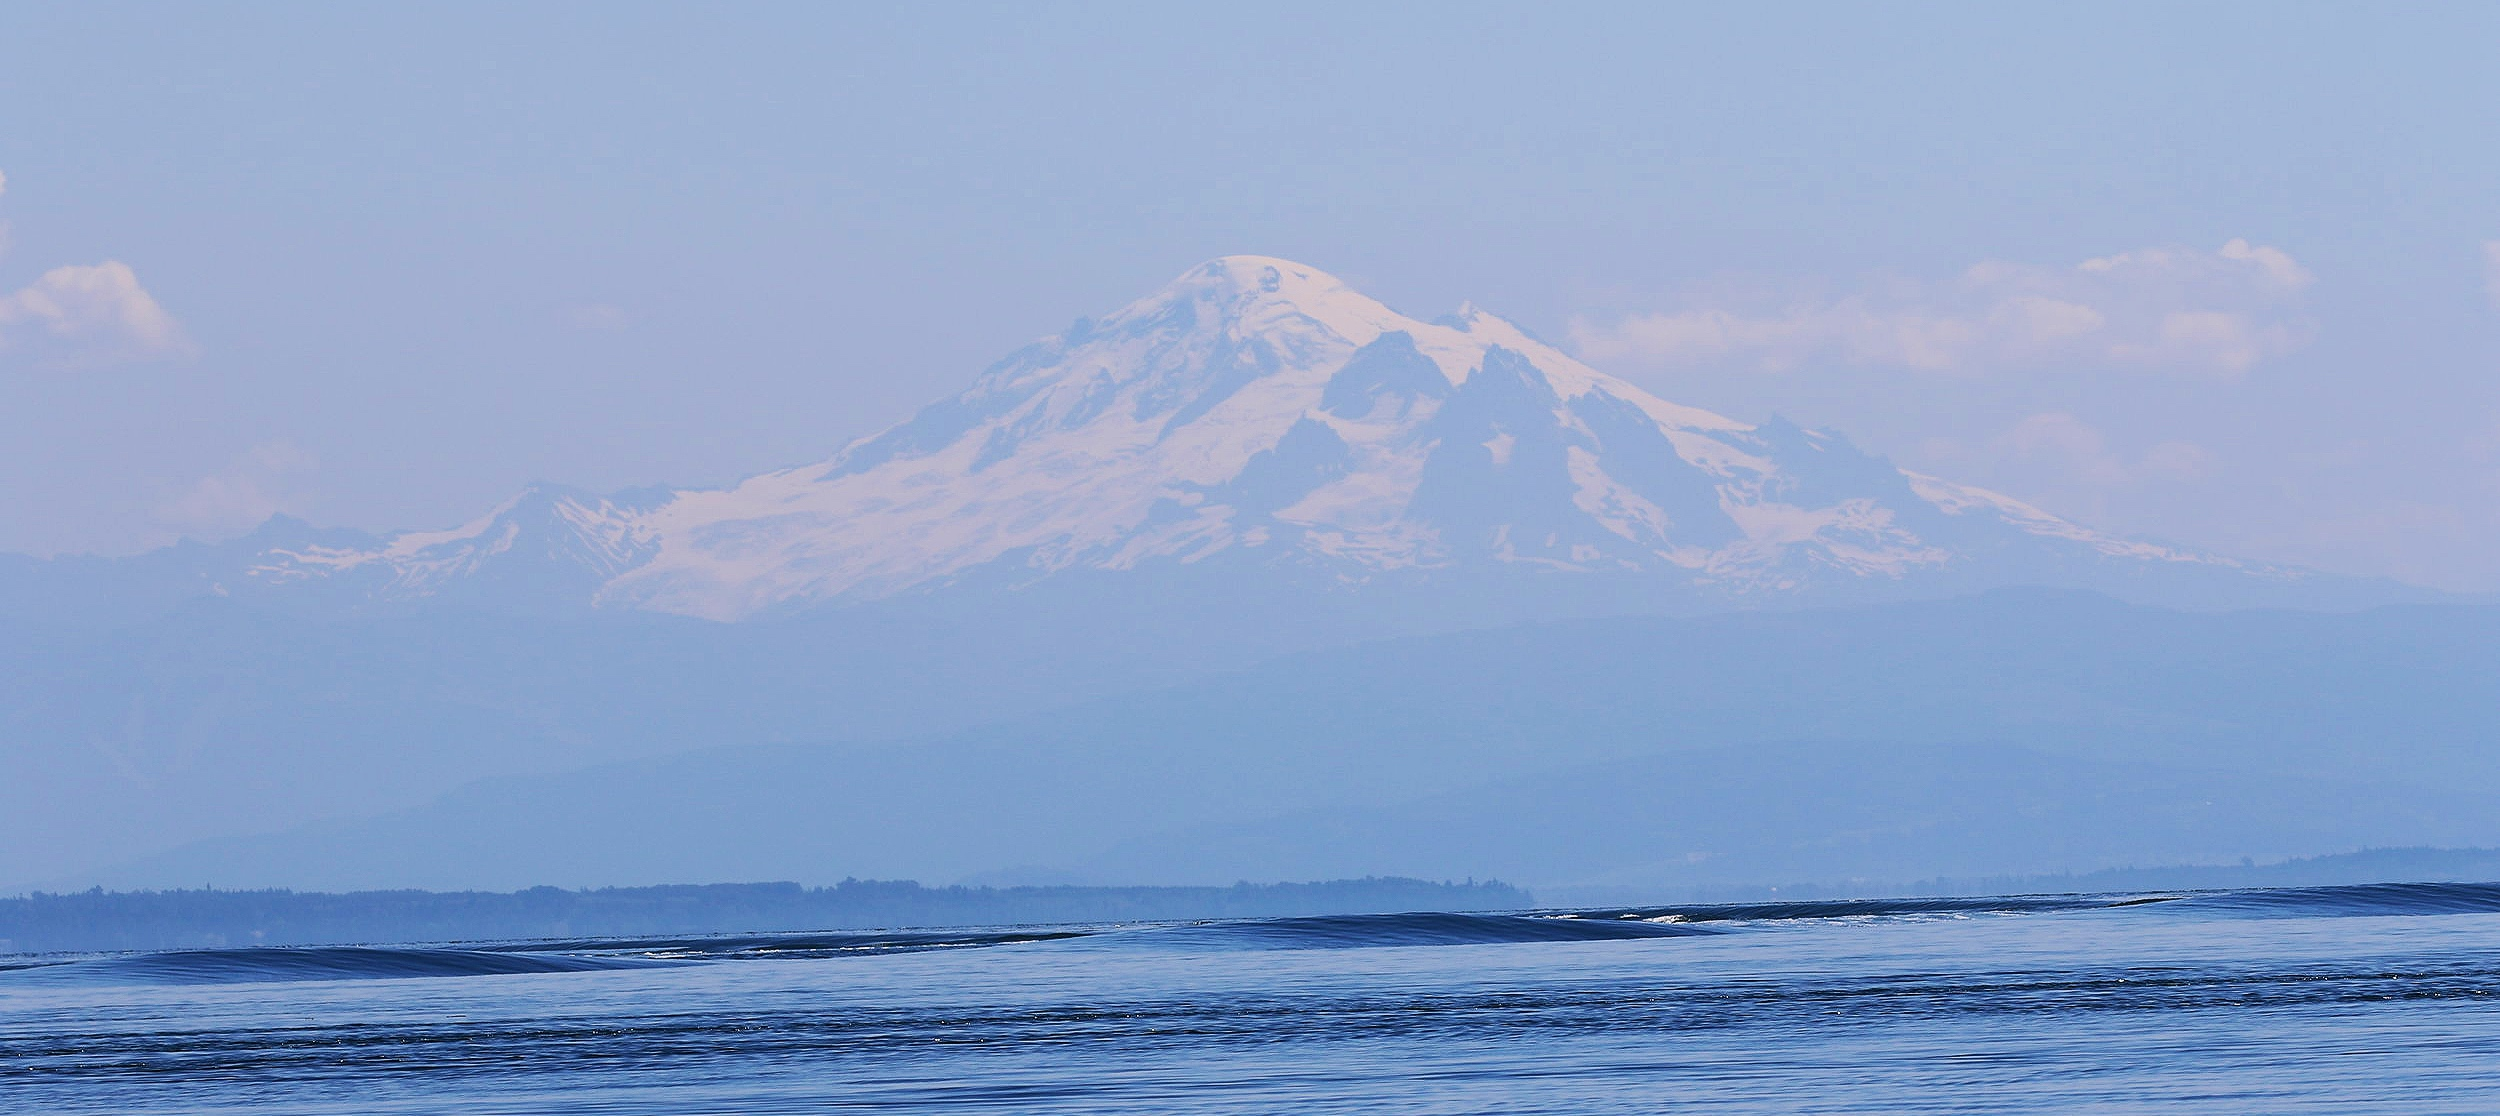 Mount Baker. Photo by Alanna Vivani (10.30)